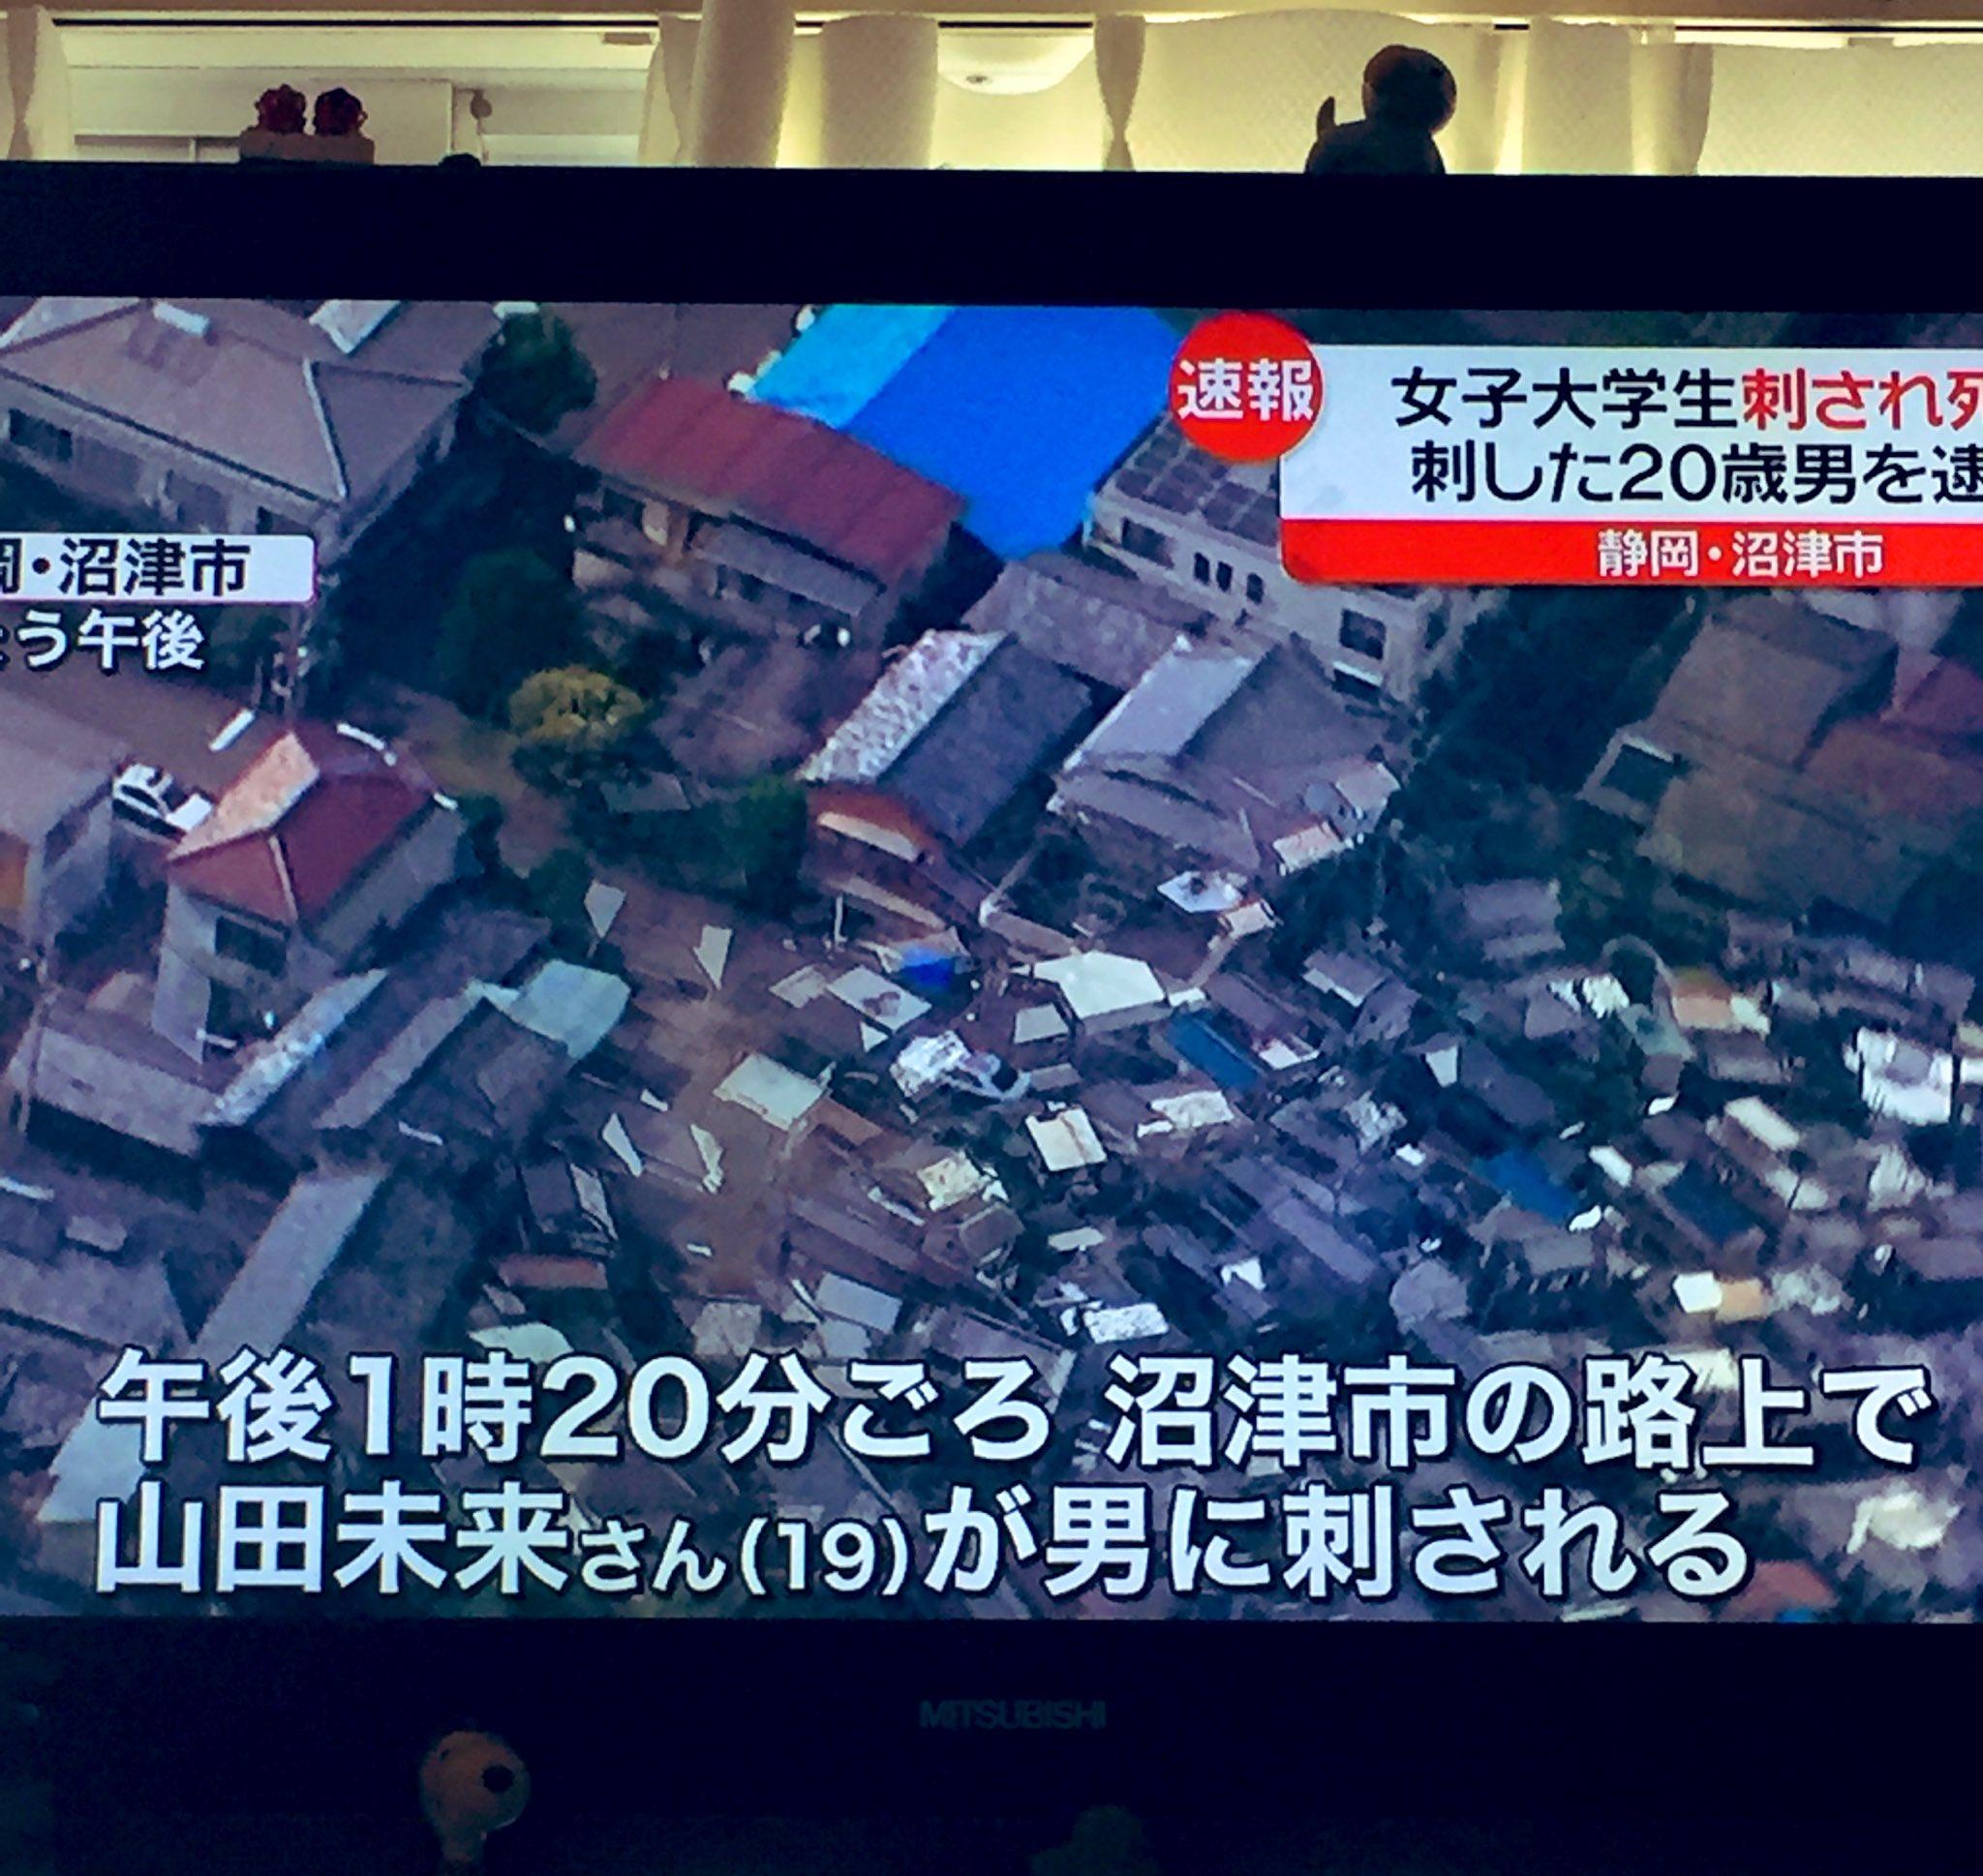 "画像,""沼津 で、殺人 事件💀‼️ https://t.co/OTGJ5Ehx6n。"